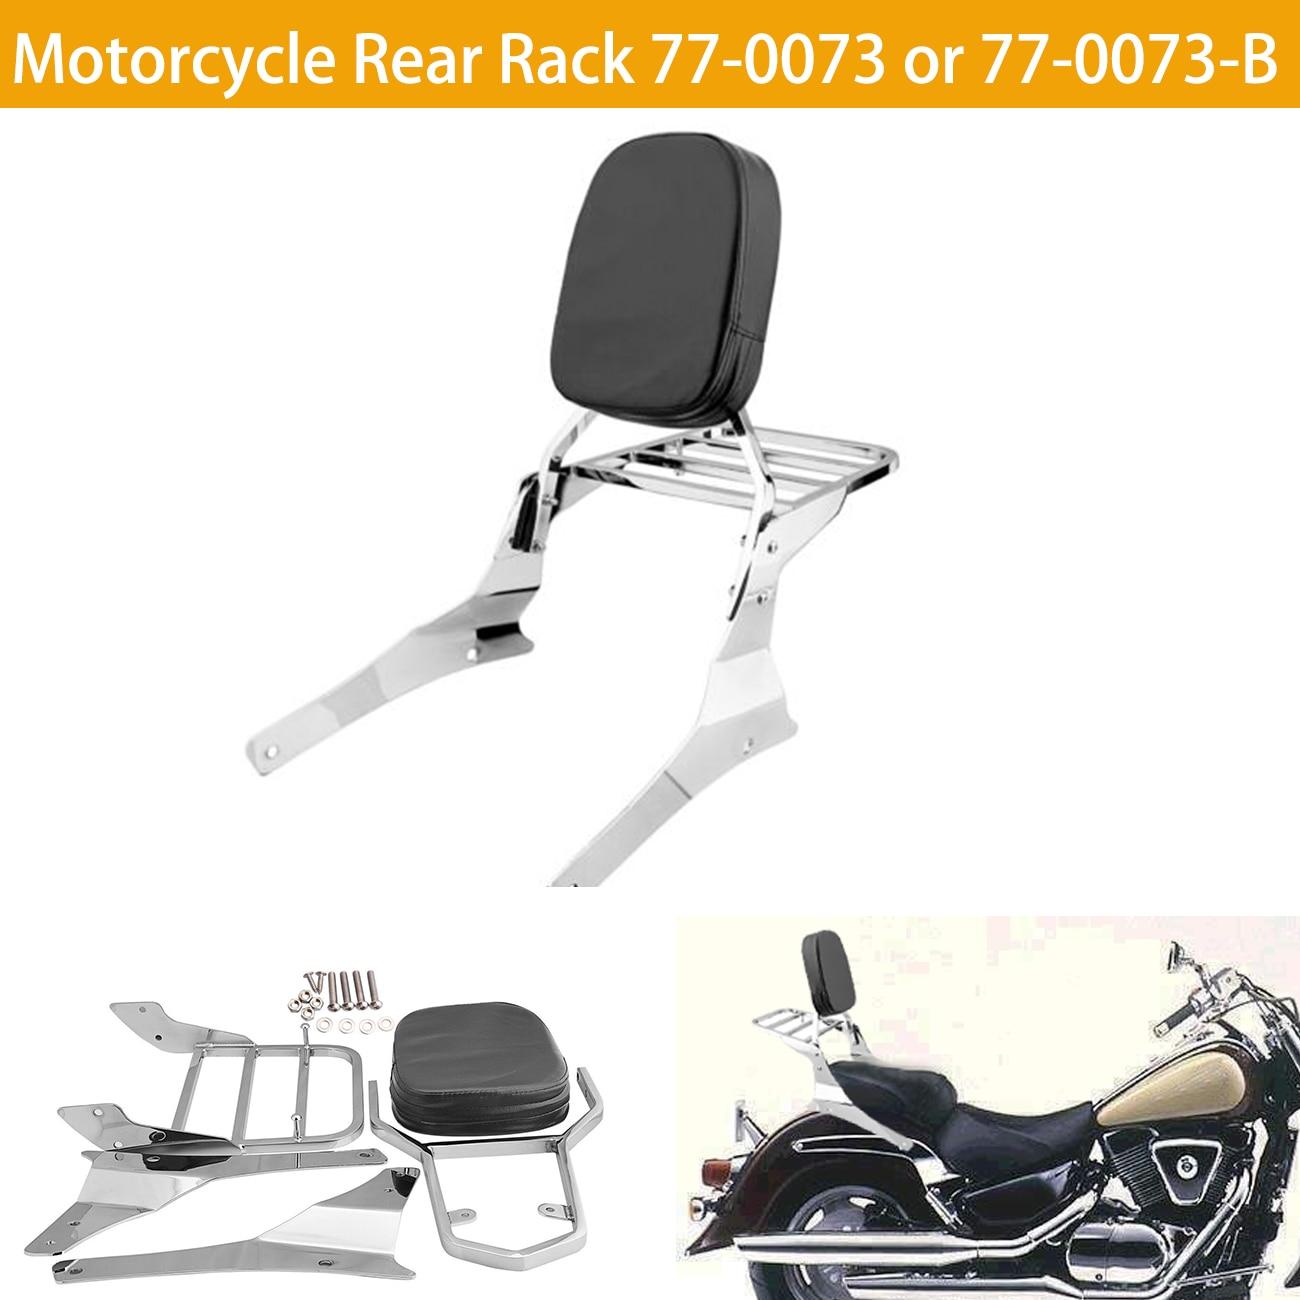 Motorcycle Luggage Rack Rear Passenger Backrest Sissy Bar Black Chrome For Suzuki Intruder / Volusia VL800 VL400 Boulevard C50